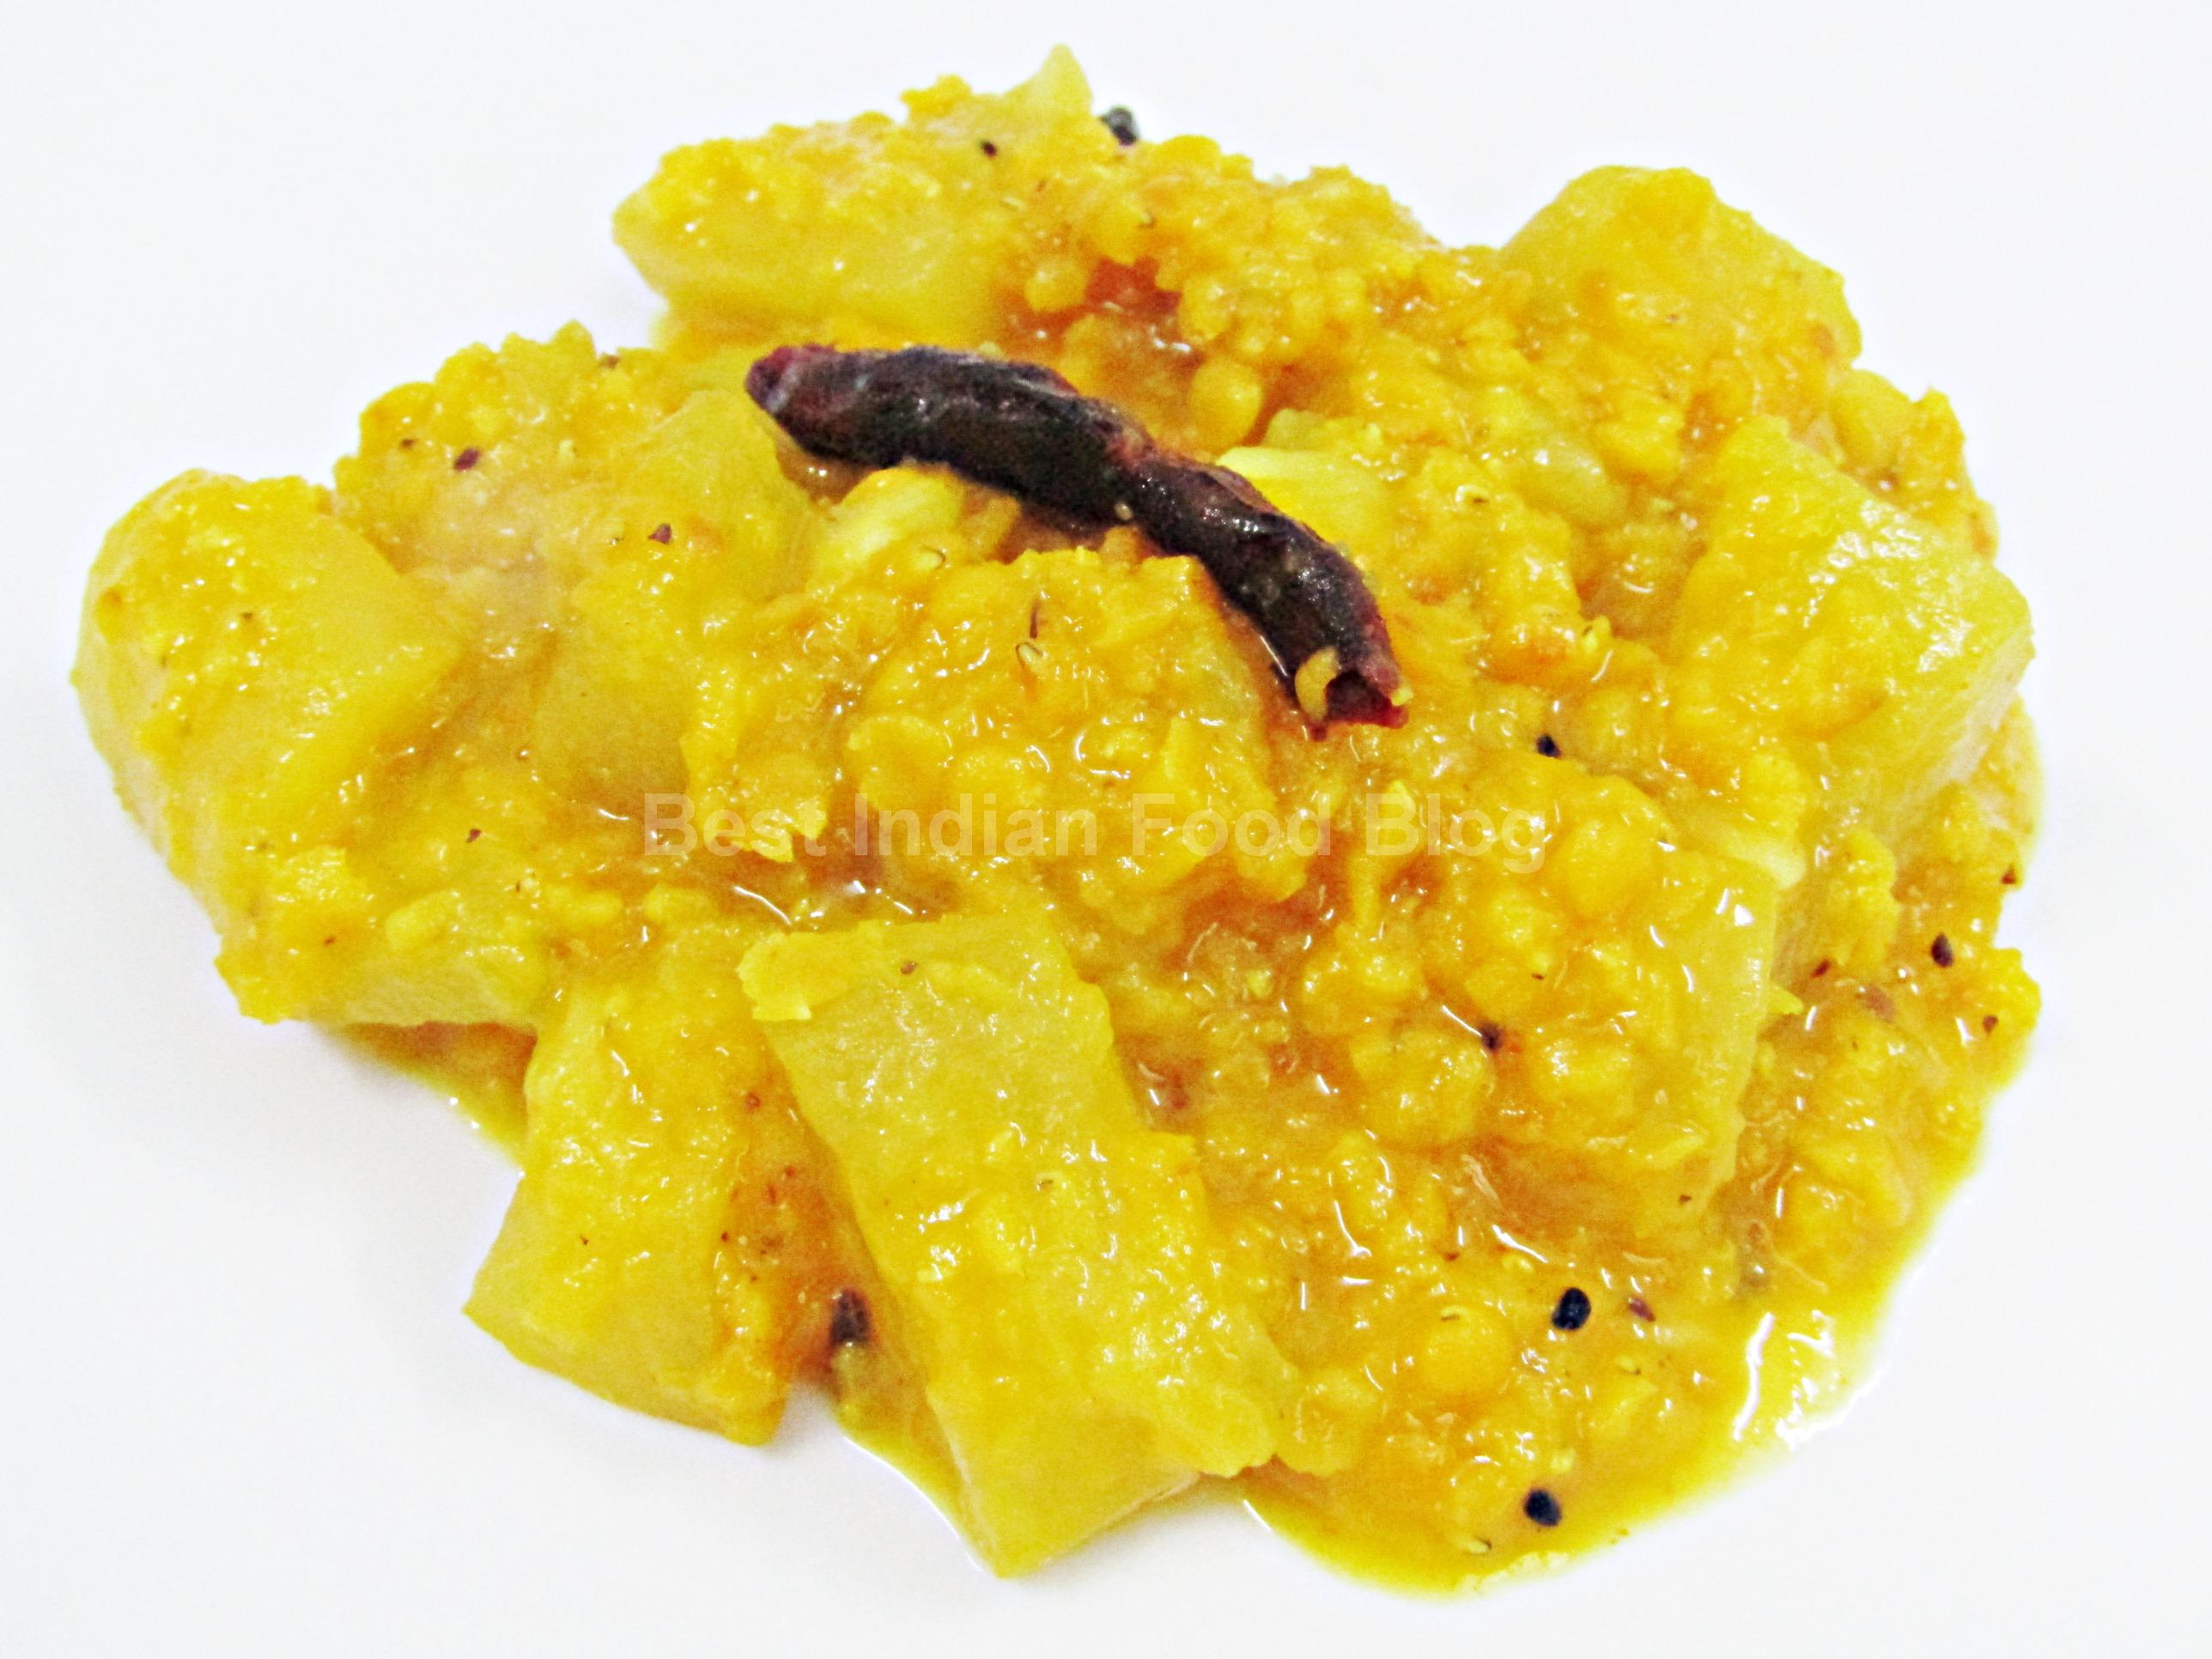 Lauki Masoor Dal from Uttar Pradesh, India | Best Indian Food Blog | Calabash Lentils recipe